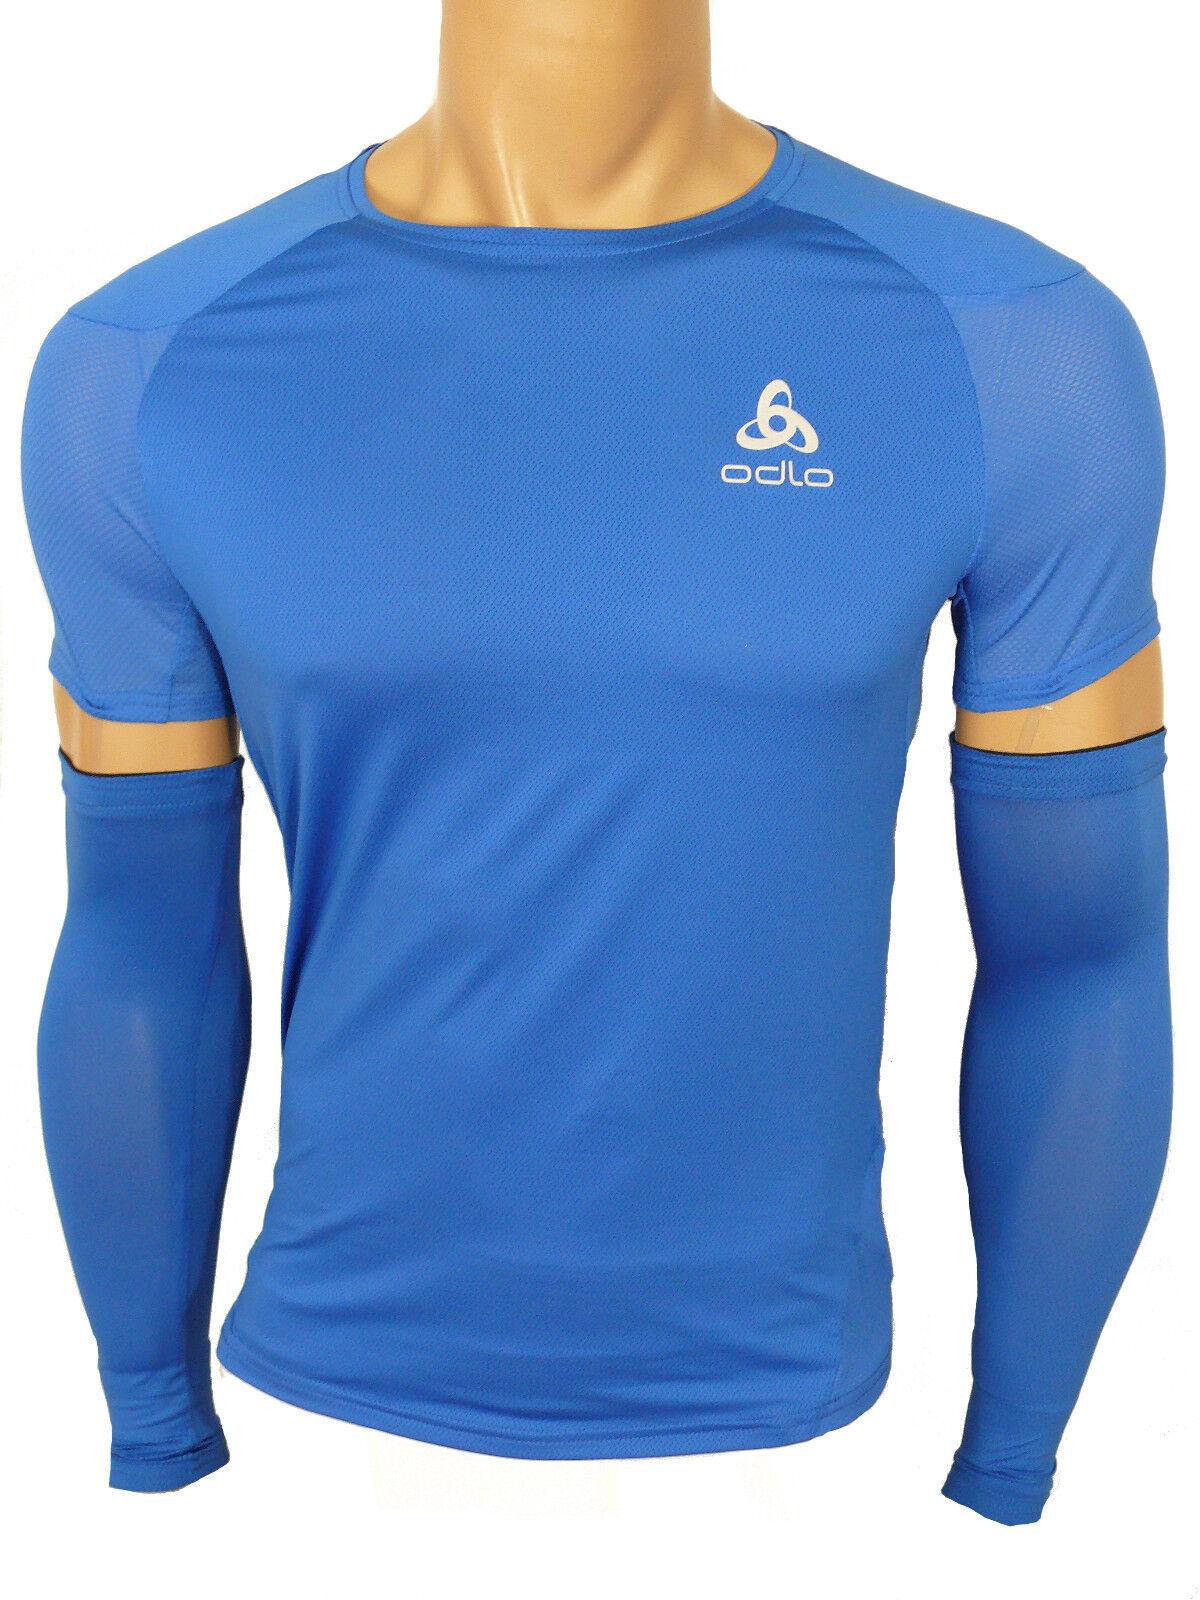 Odlo Men's Running Shirt Longsleeve sz. S